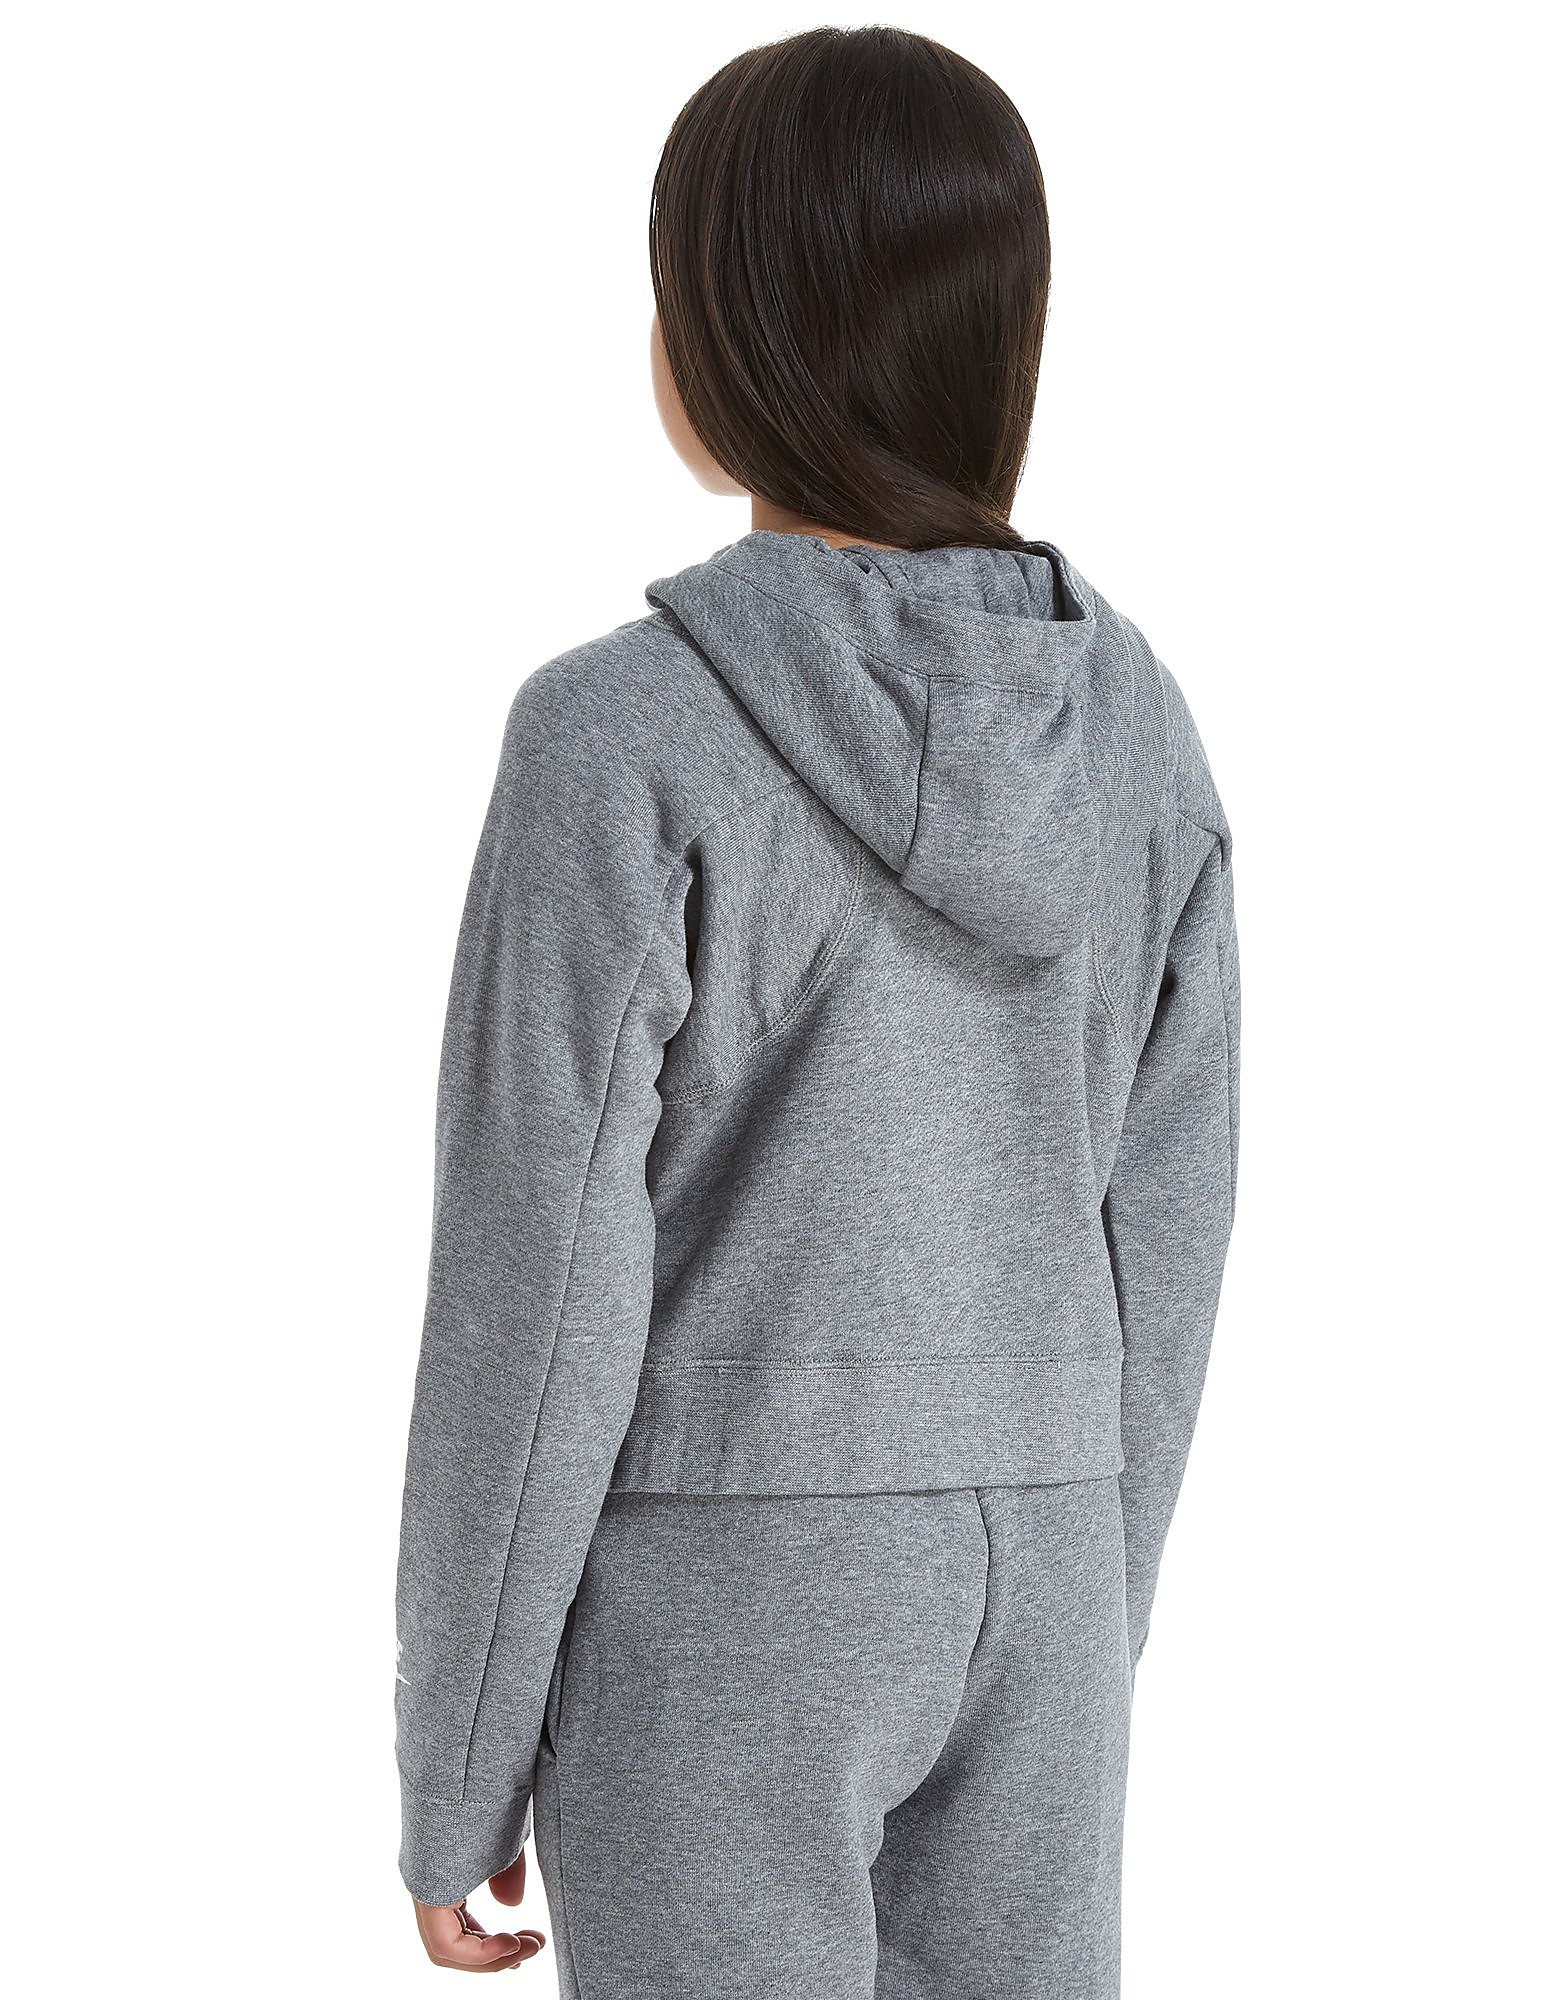 Nike Girls' Just Do It Cropped Hoodie Junior